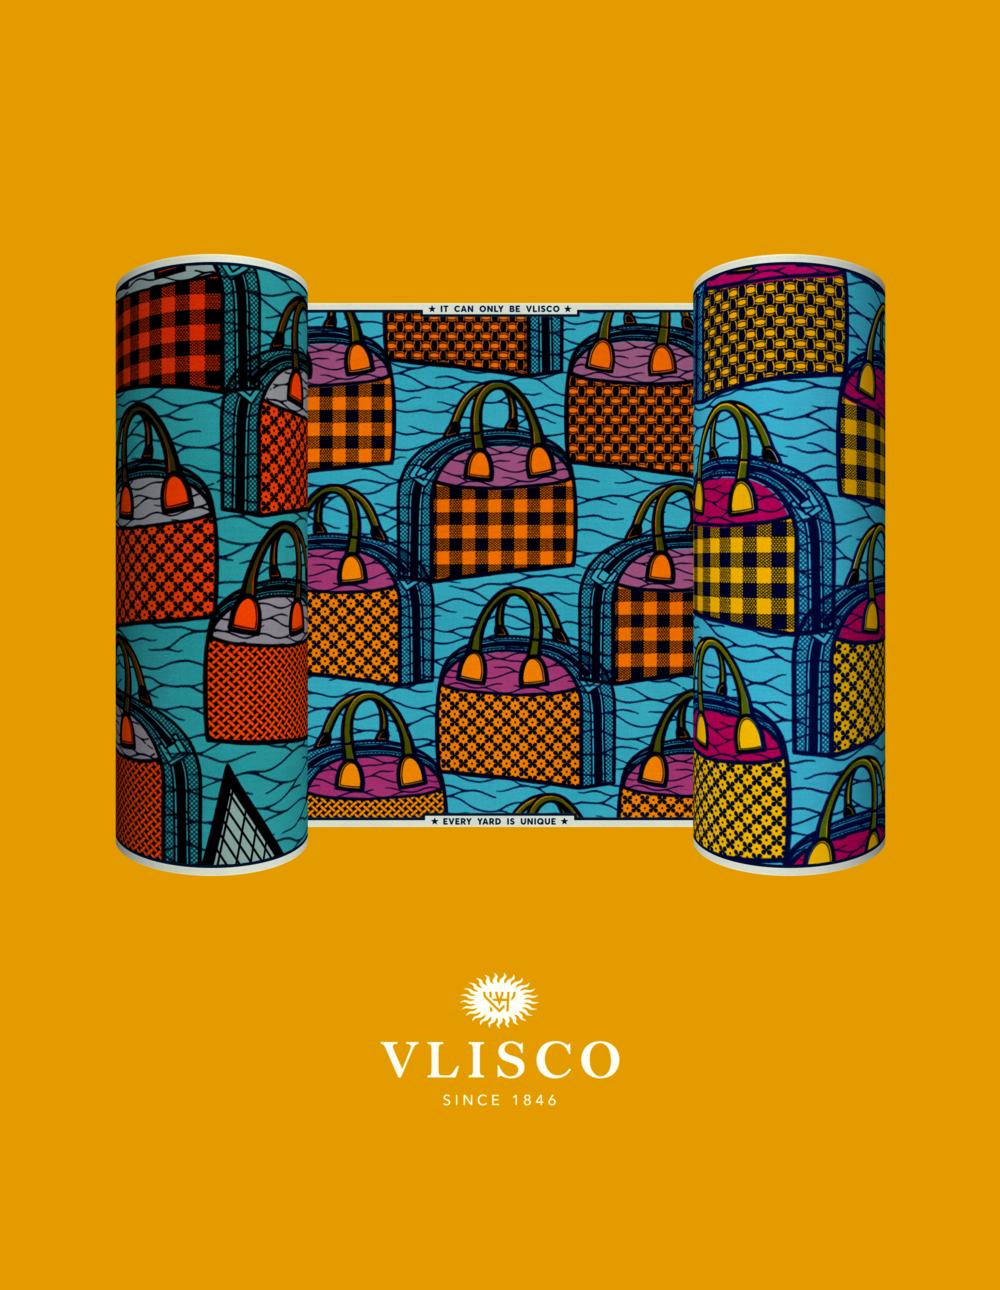 VLISCO_PRINT_00014.png